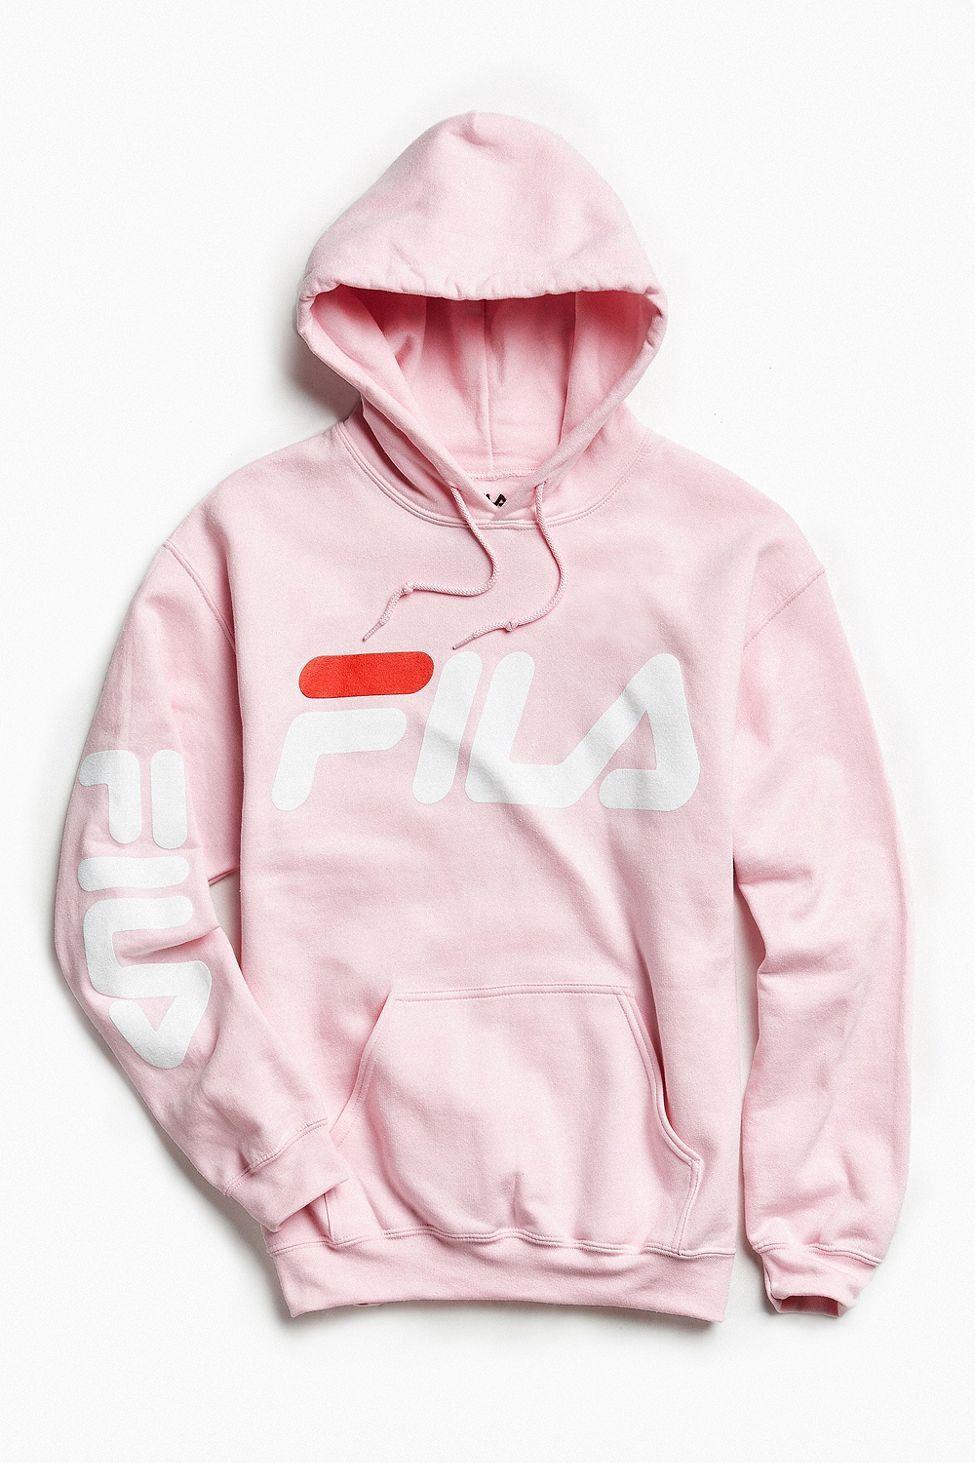 a27c4e3e5d83 Urban Outfitters Fila Script Hoodie Sweatshirt - Black S One Size Pink